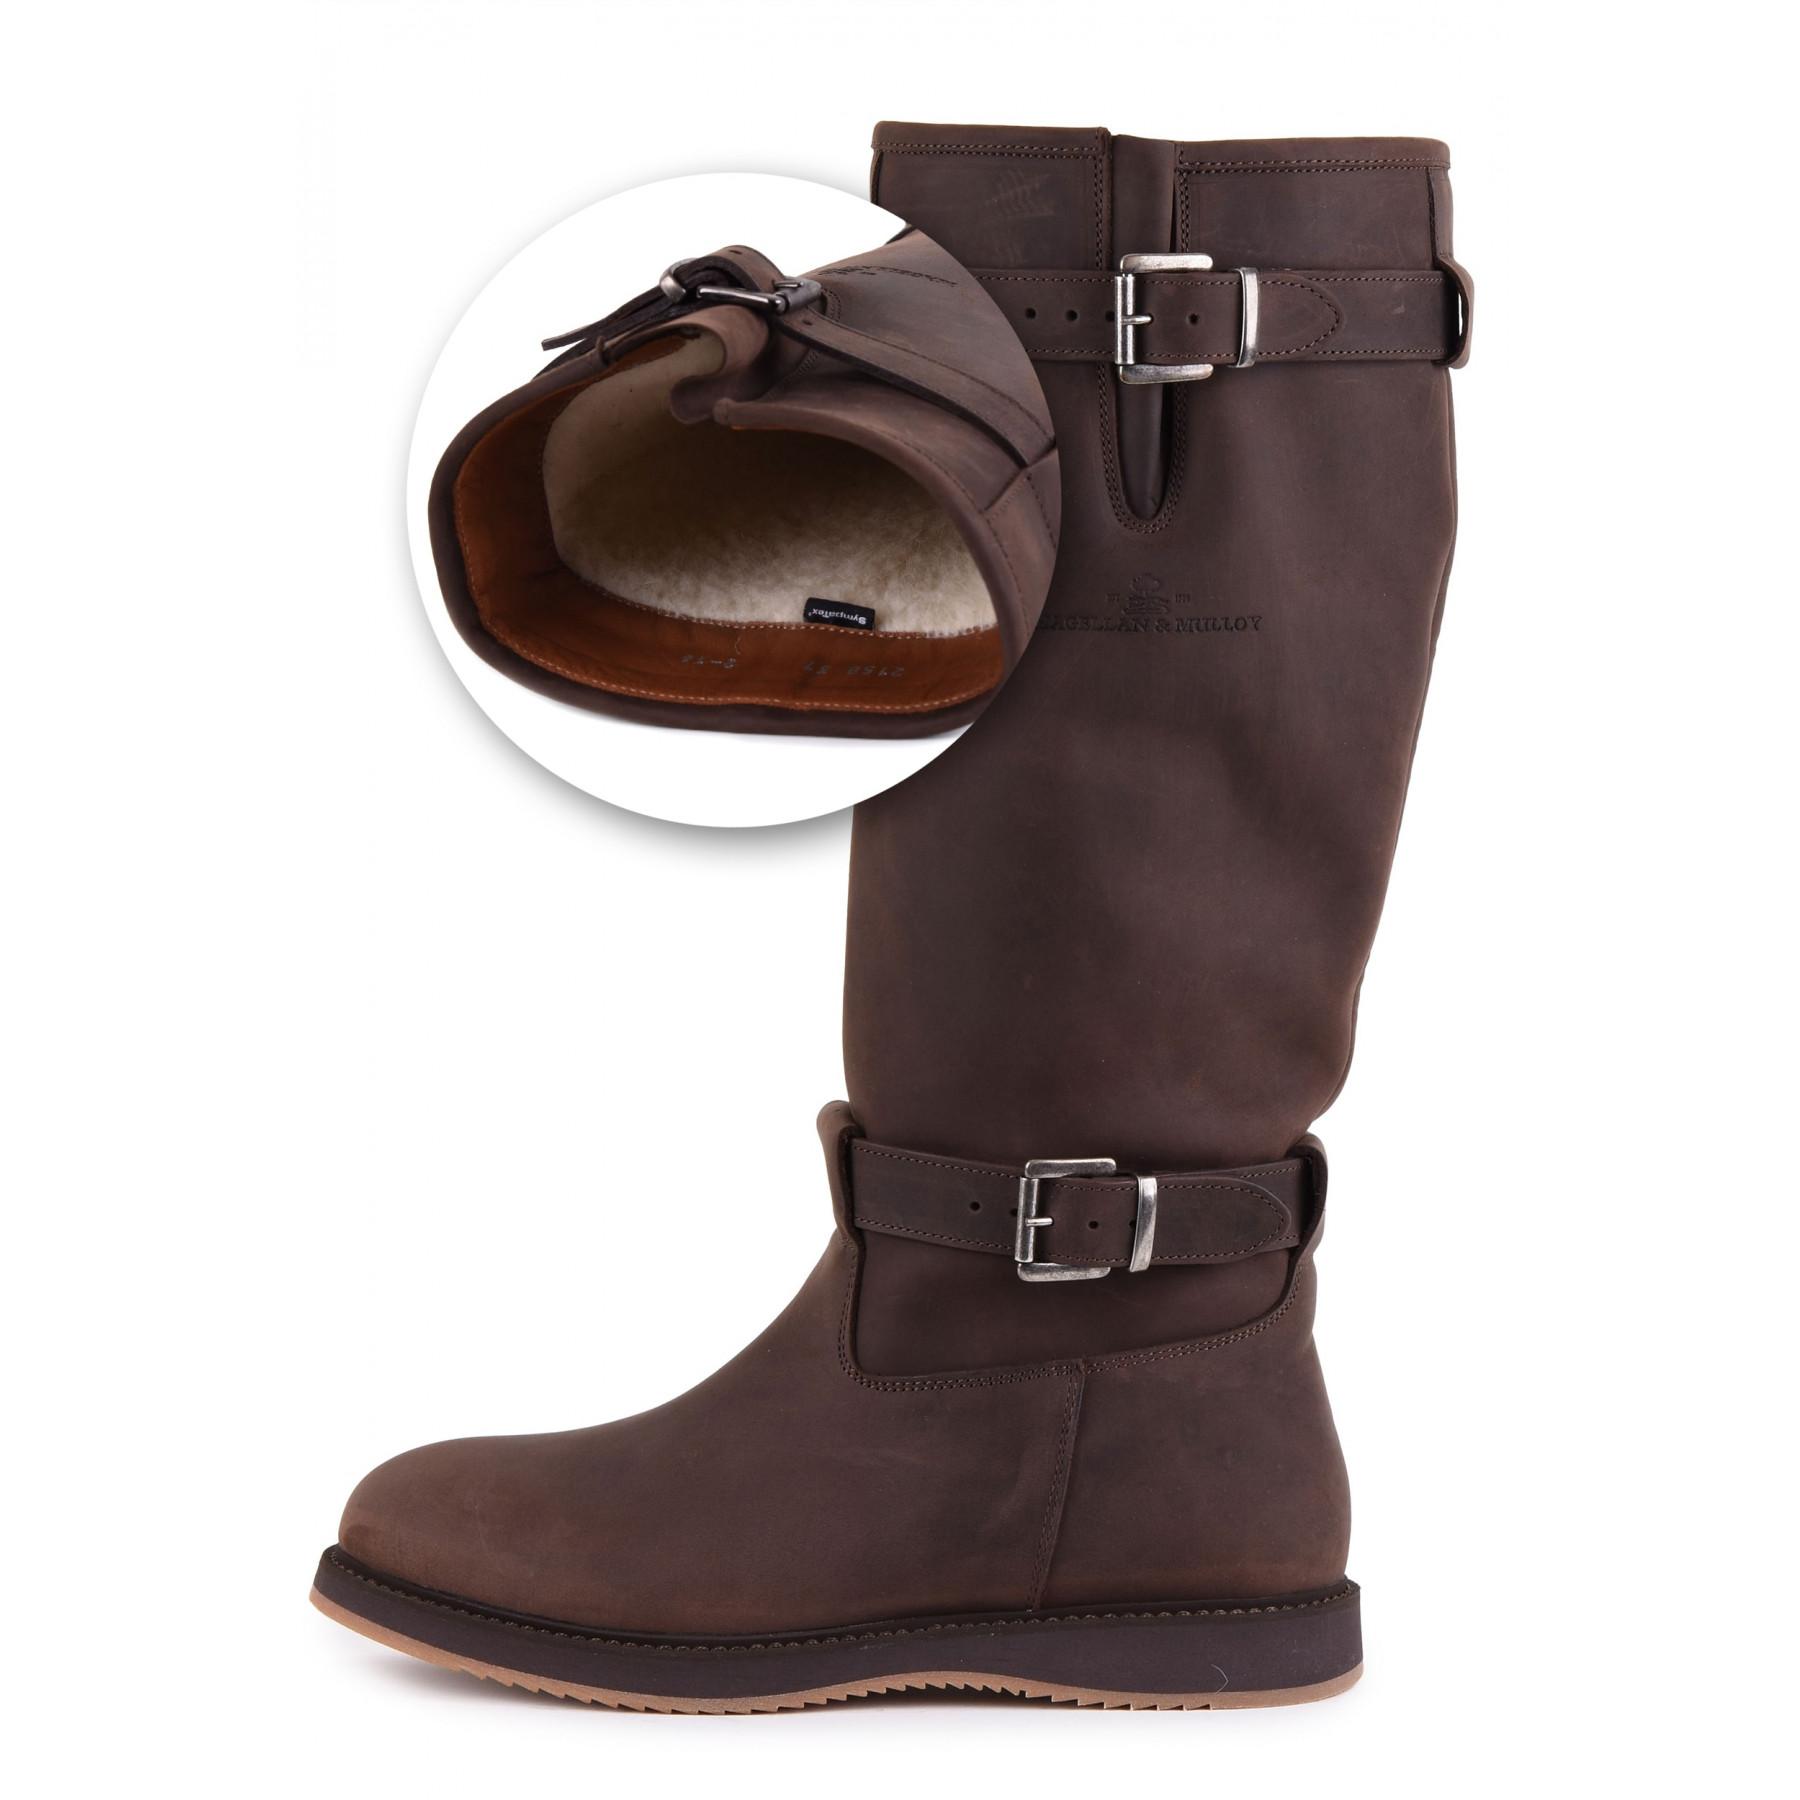 Magellan & Mulloy Xscape Denver Lamb Lining Brown, brown ladies outdoor boot, size 42